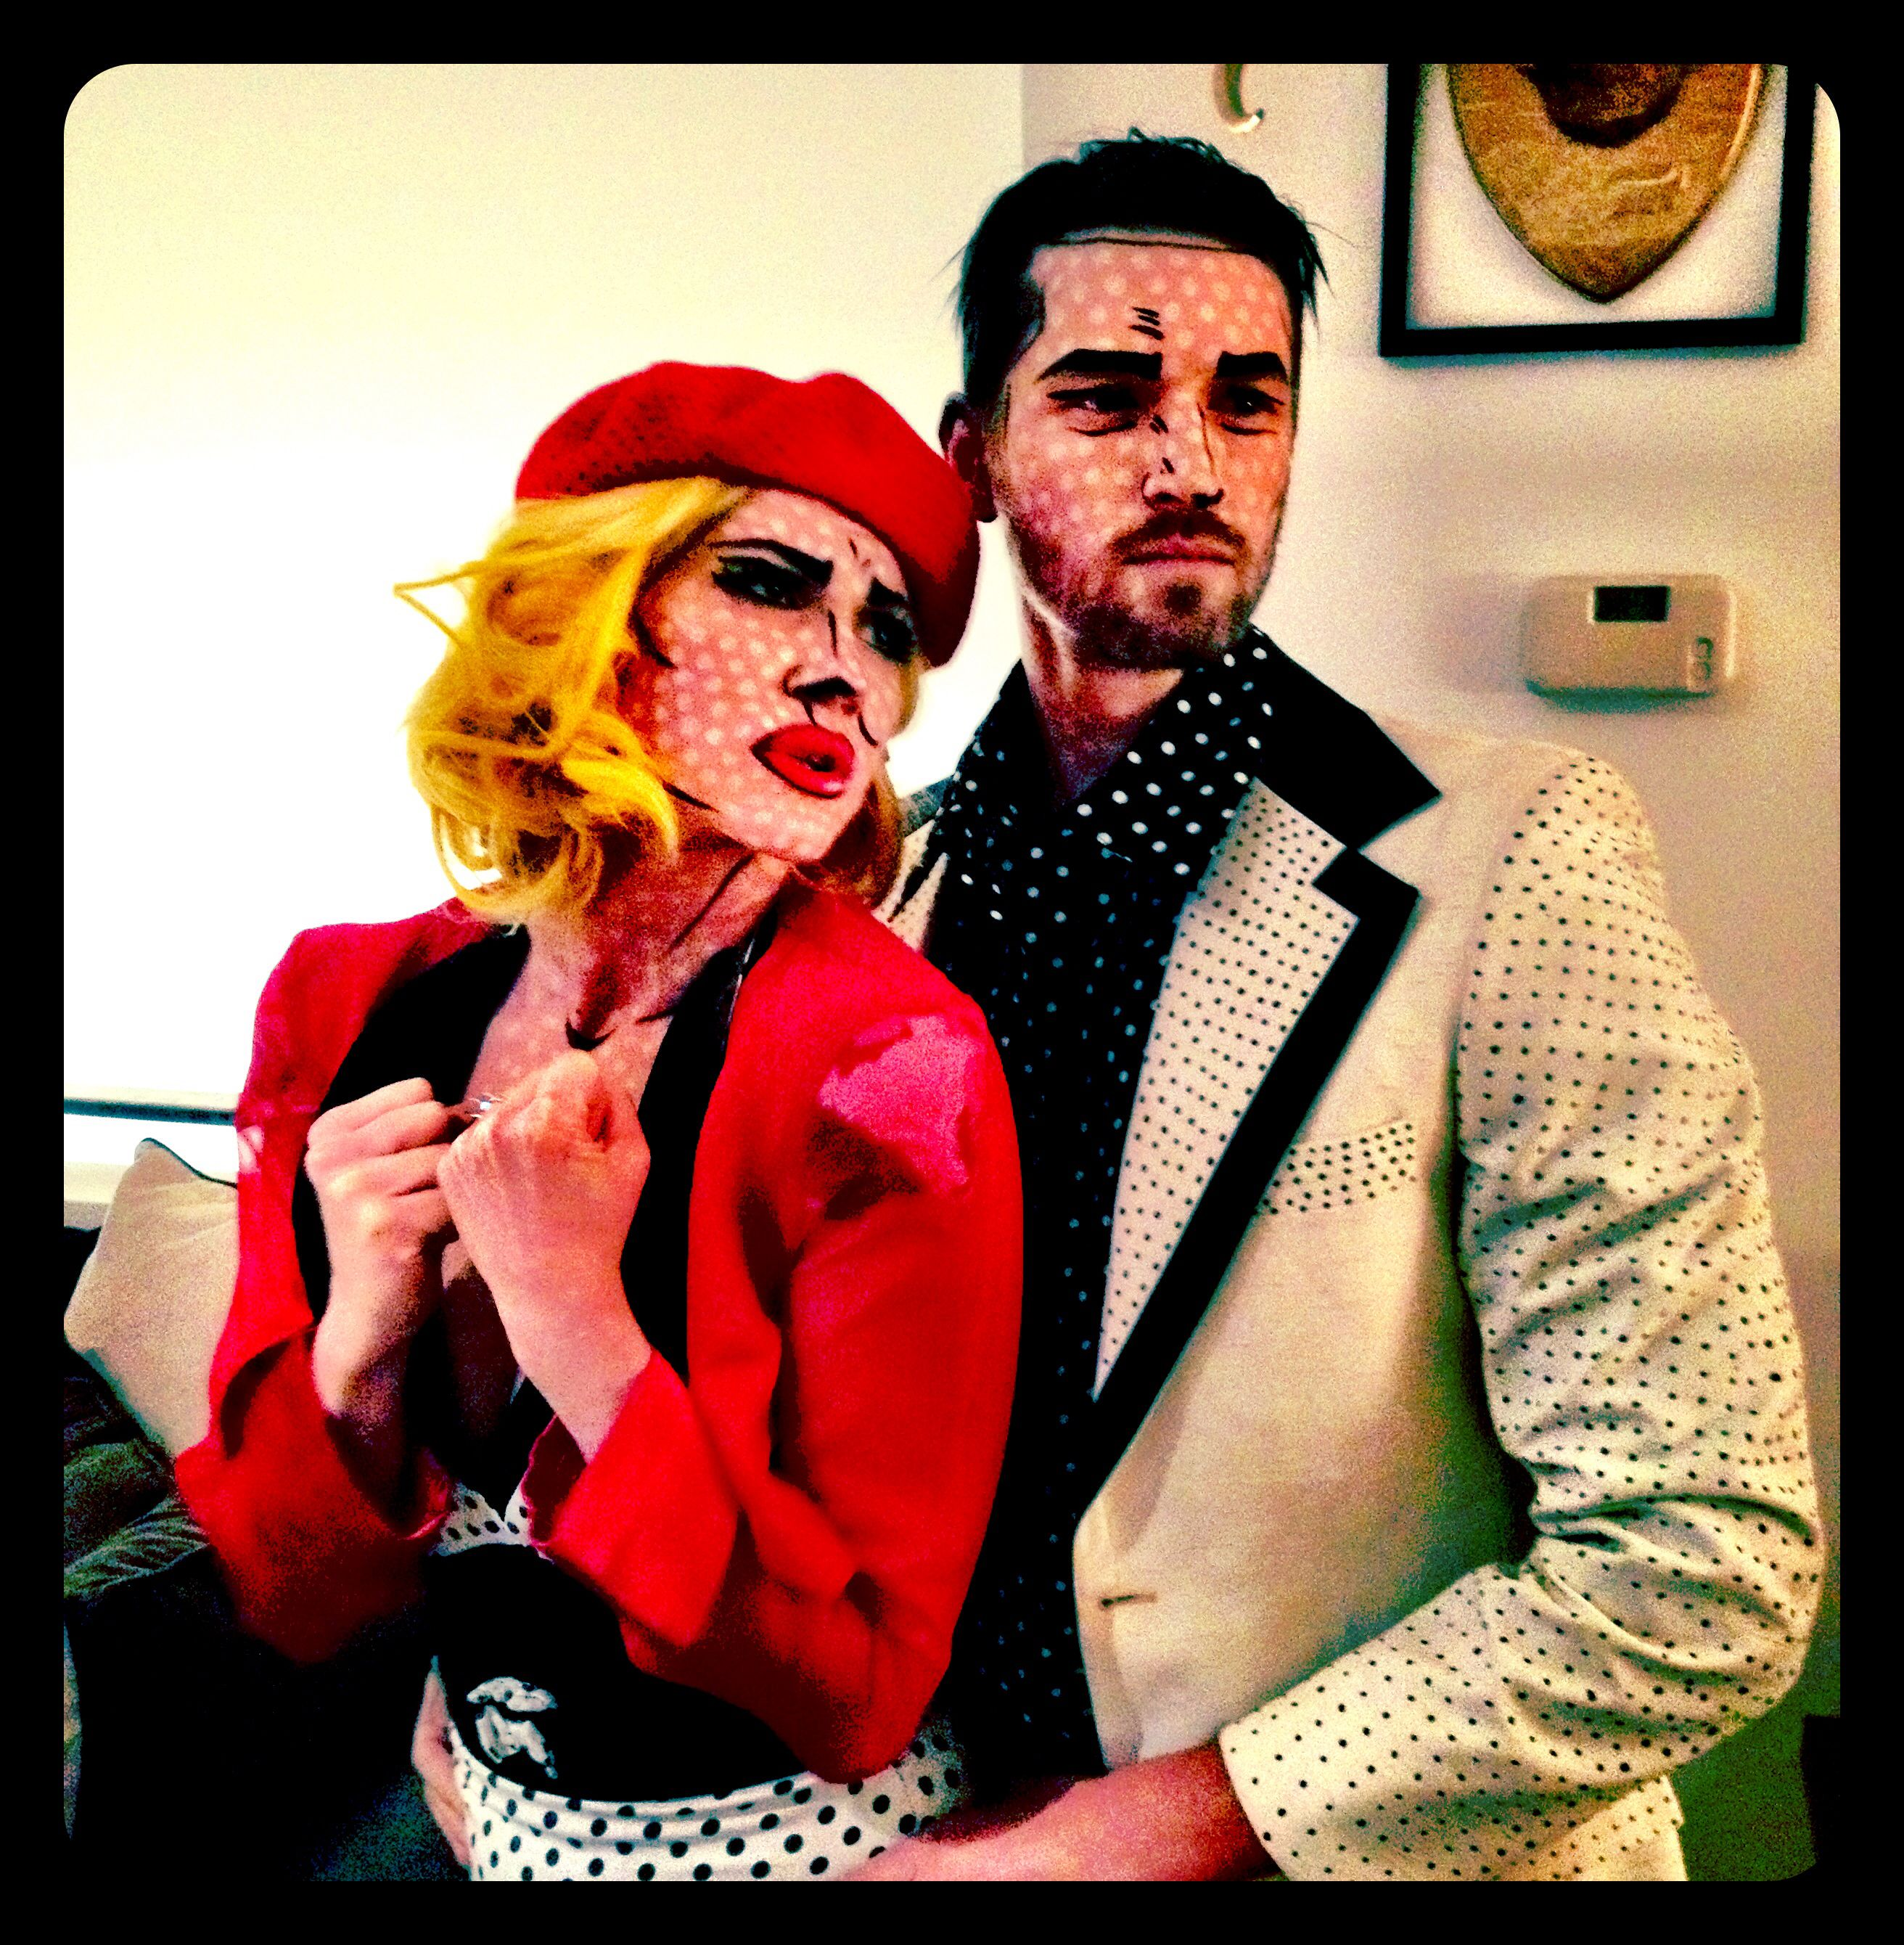 Halloween Party Breda.Roy Lichtenstein Couples Costume For Halloween Halloween